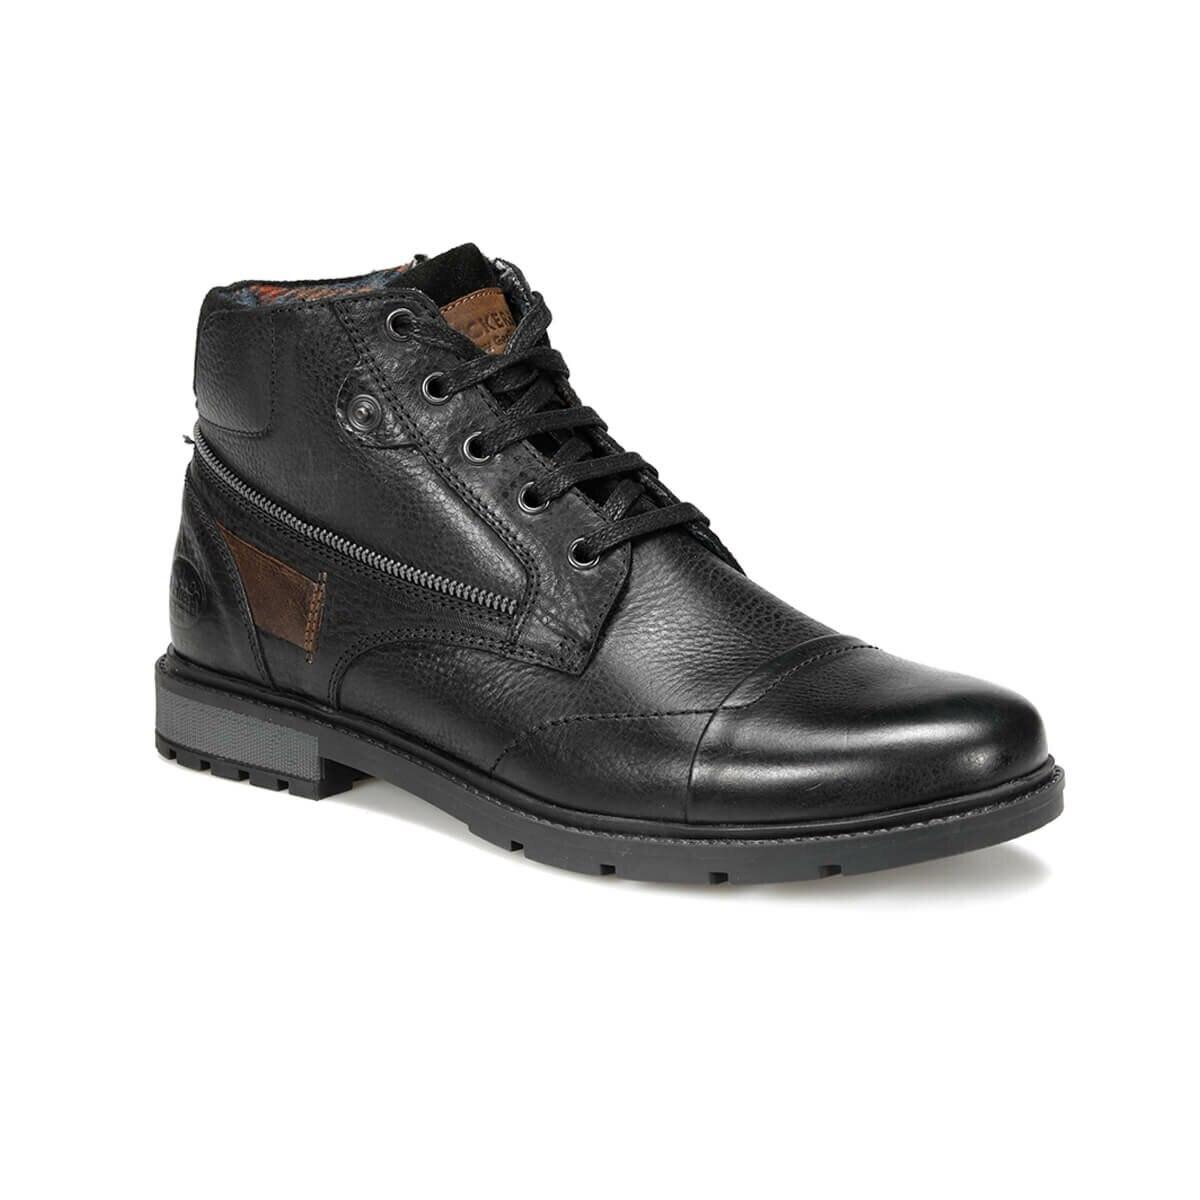 FLO 227175 9PR Black Men Boots By Dockers The Gerle